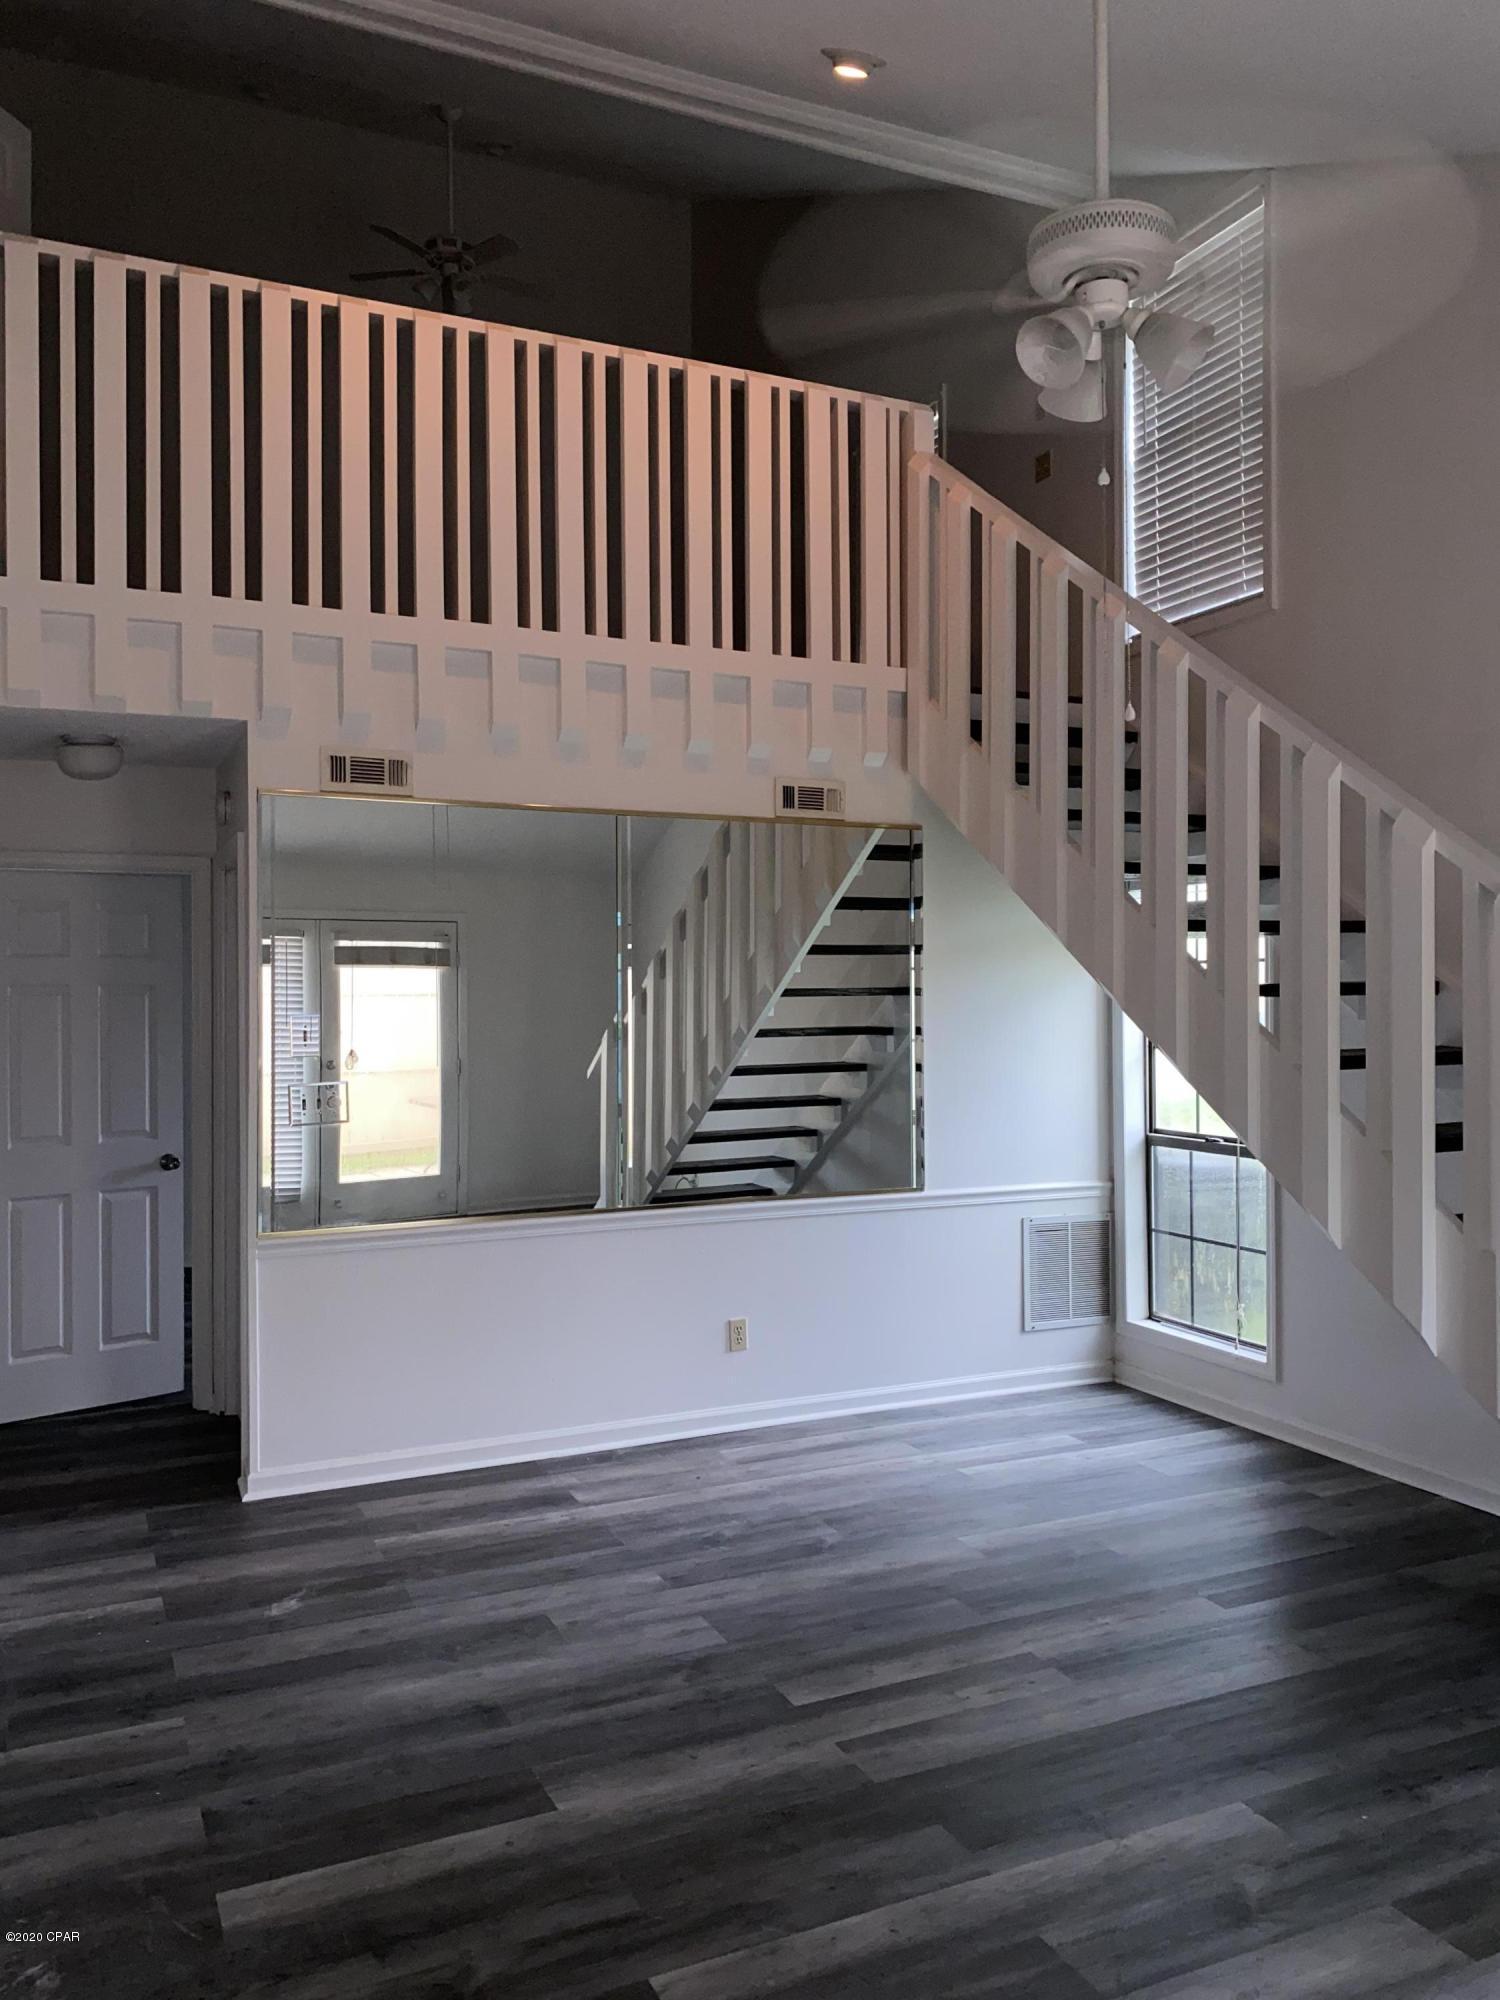 A 2 Bedroom 2 Bedroom Horizon South X Rental